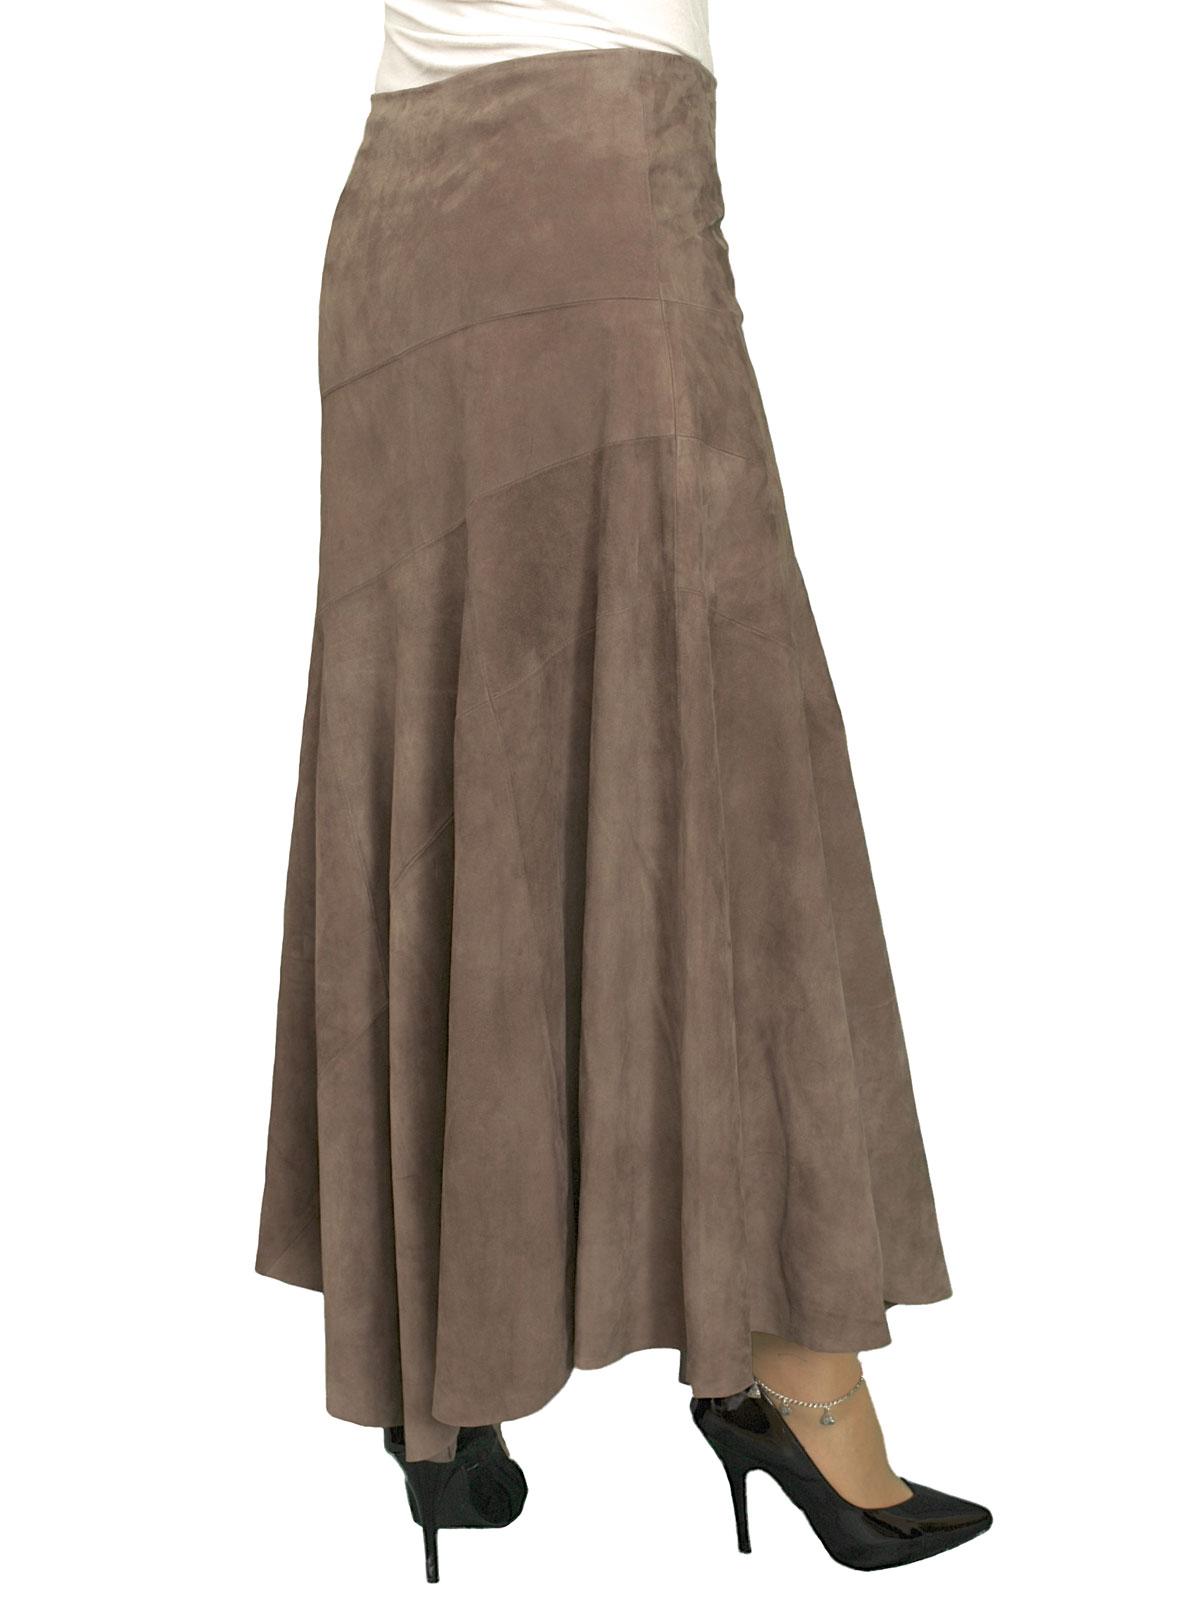 Long Suede Asymmetric Full Skirt Midi Length 6 Colours